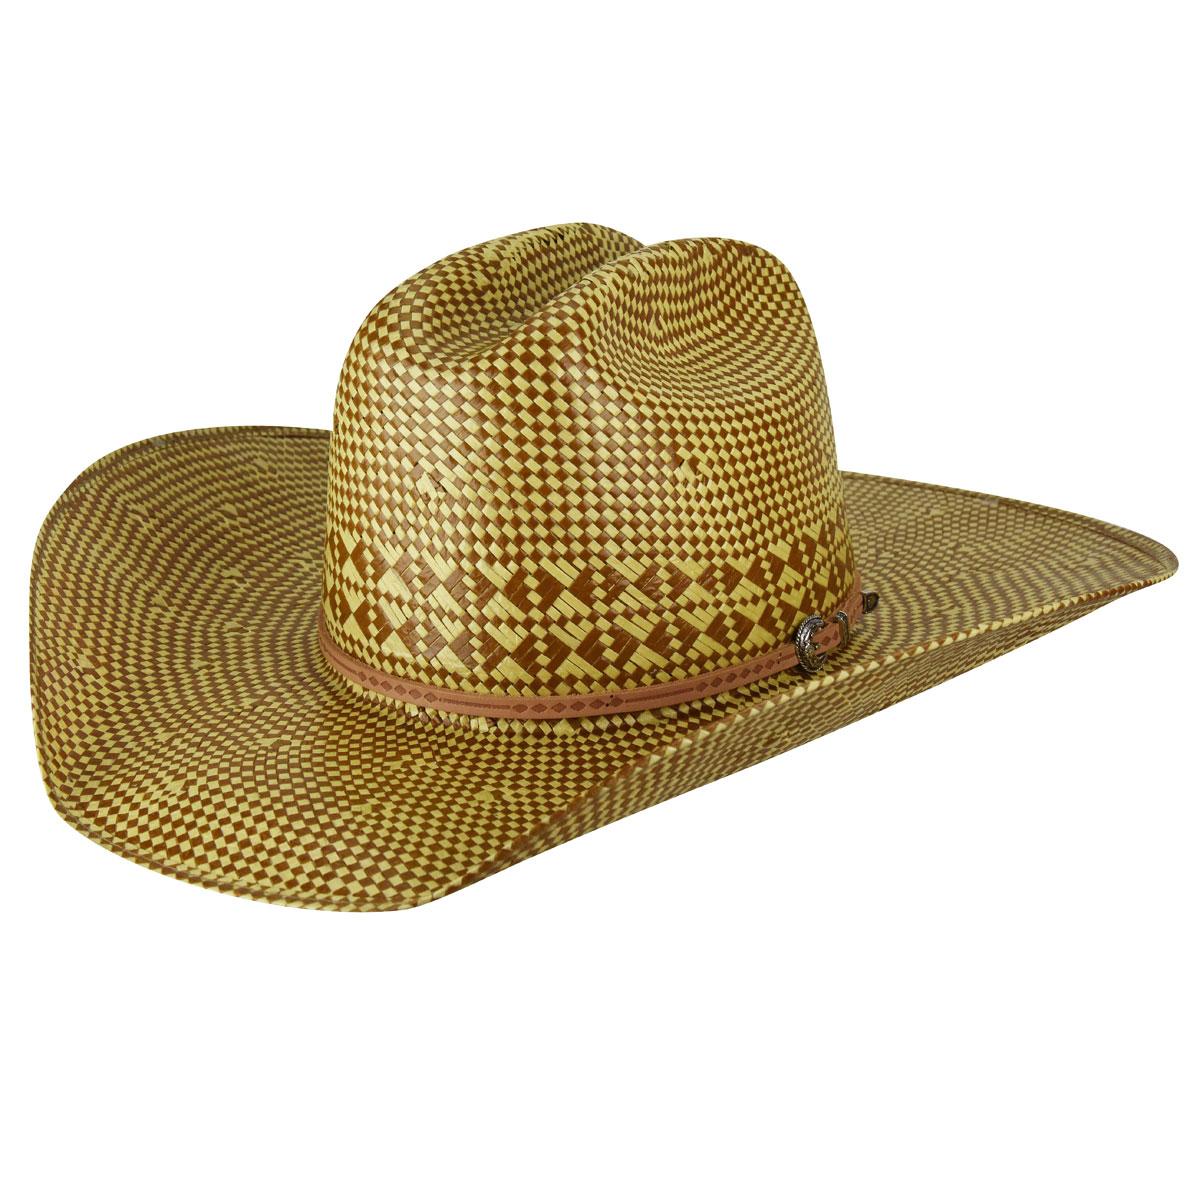 Bailey Western Cinch 10X Western Hat in NATURAL,SAND